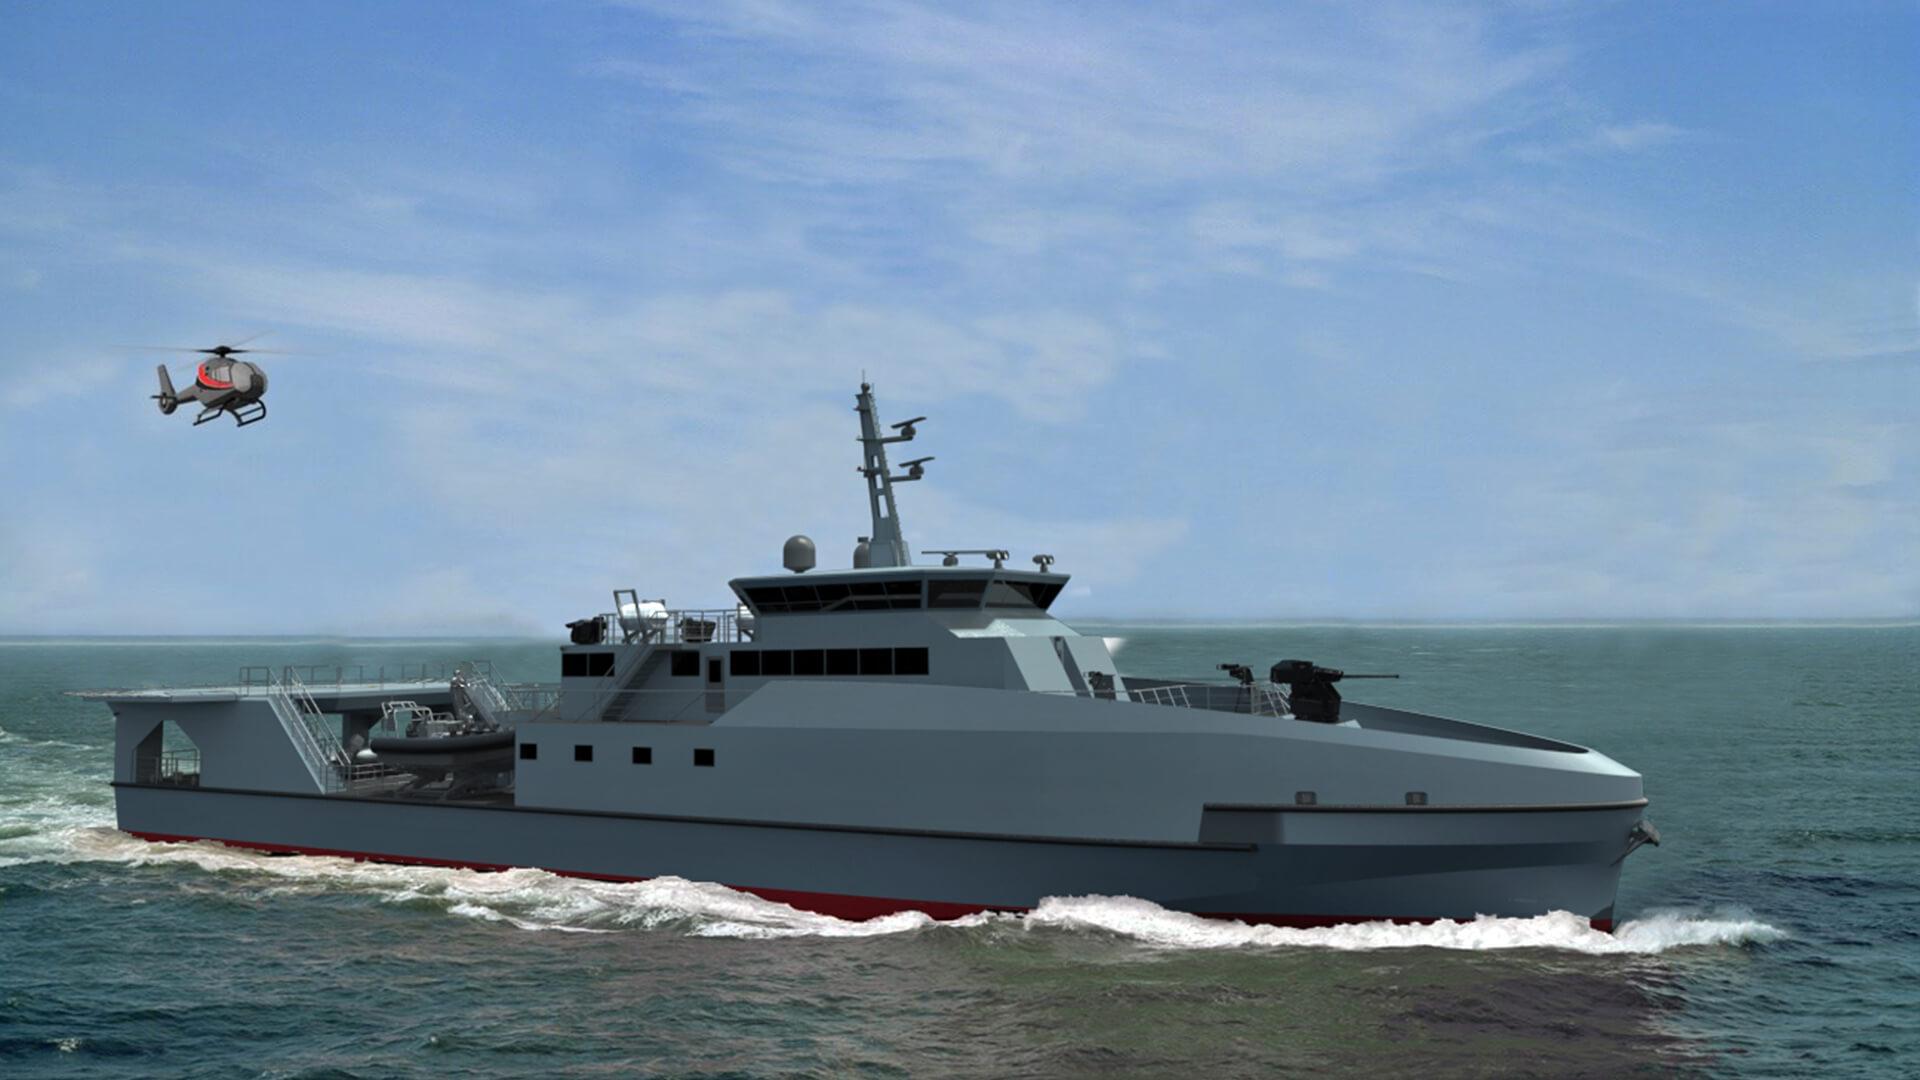 images/vessels/01-patrol-craft/01-series-opv/02-ares-55-opv/55opv_1619610716.jpeg